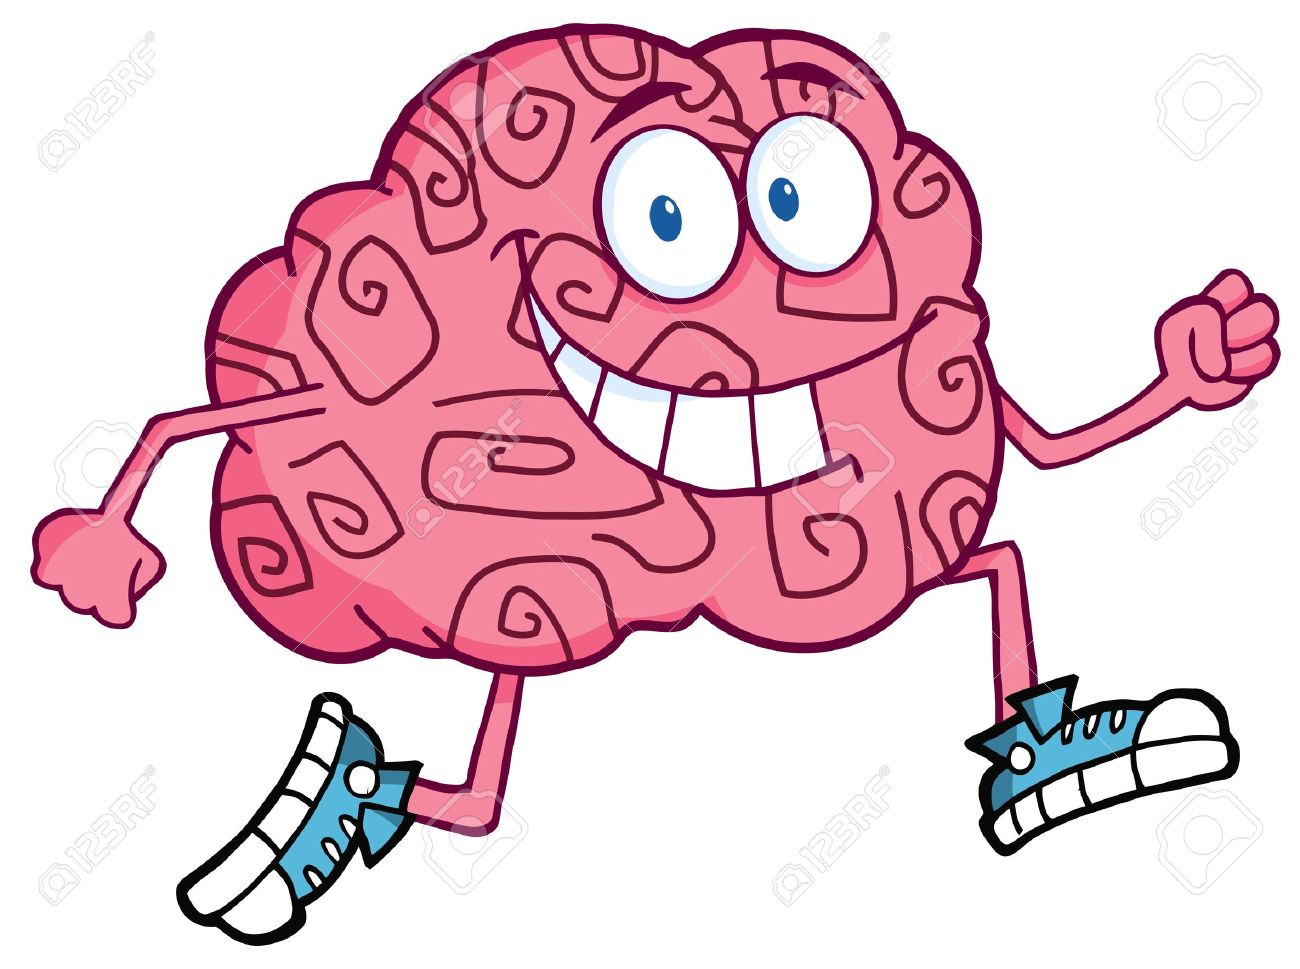 Running Brain Cartoon Character Stock Vector - 10391659